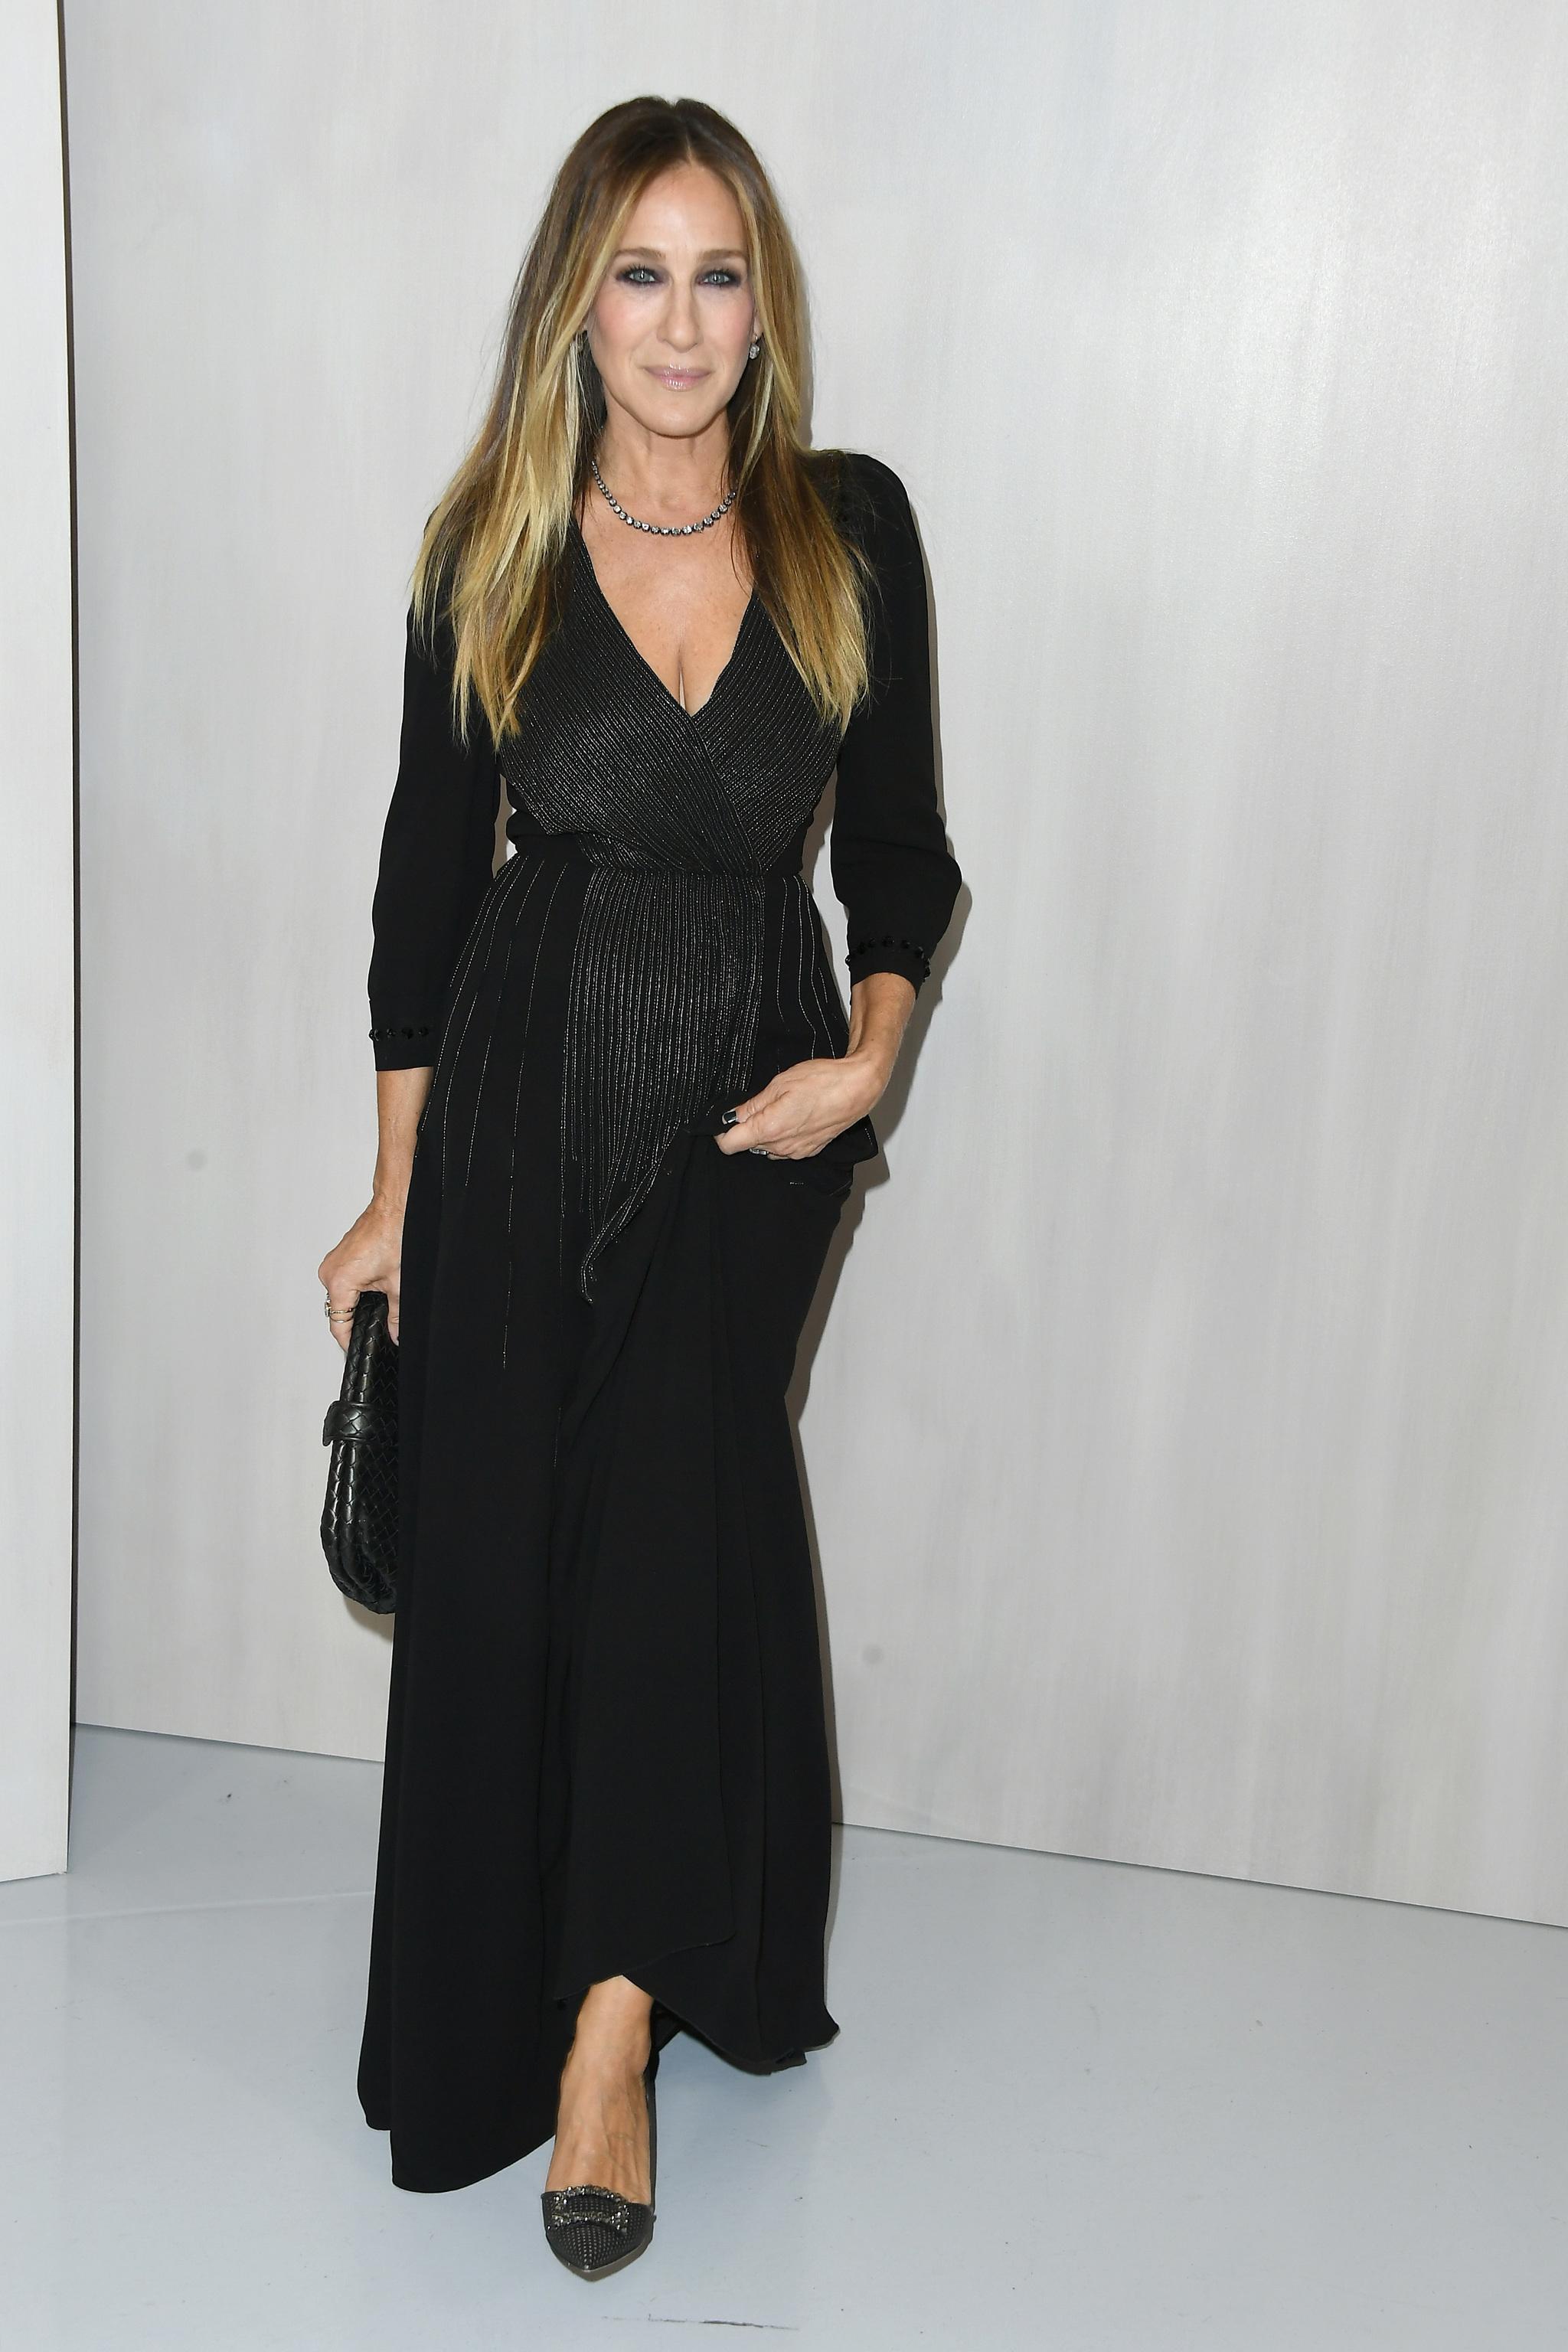 Sarah Jessica Parker con un vestido negro.